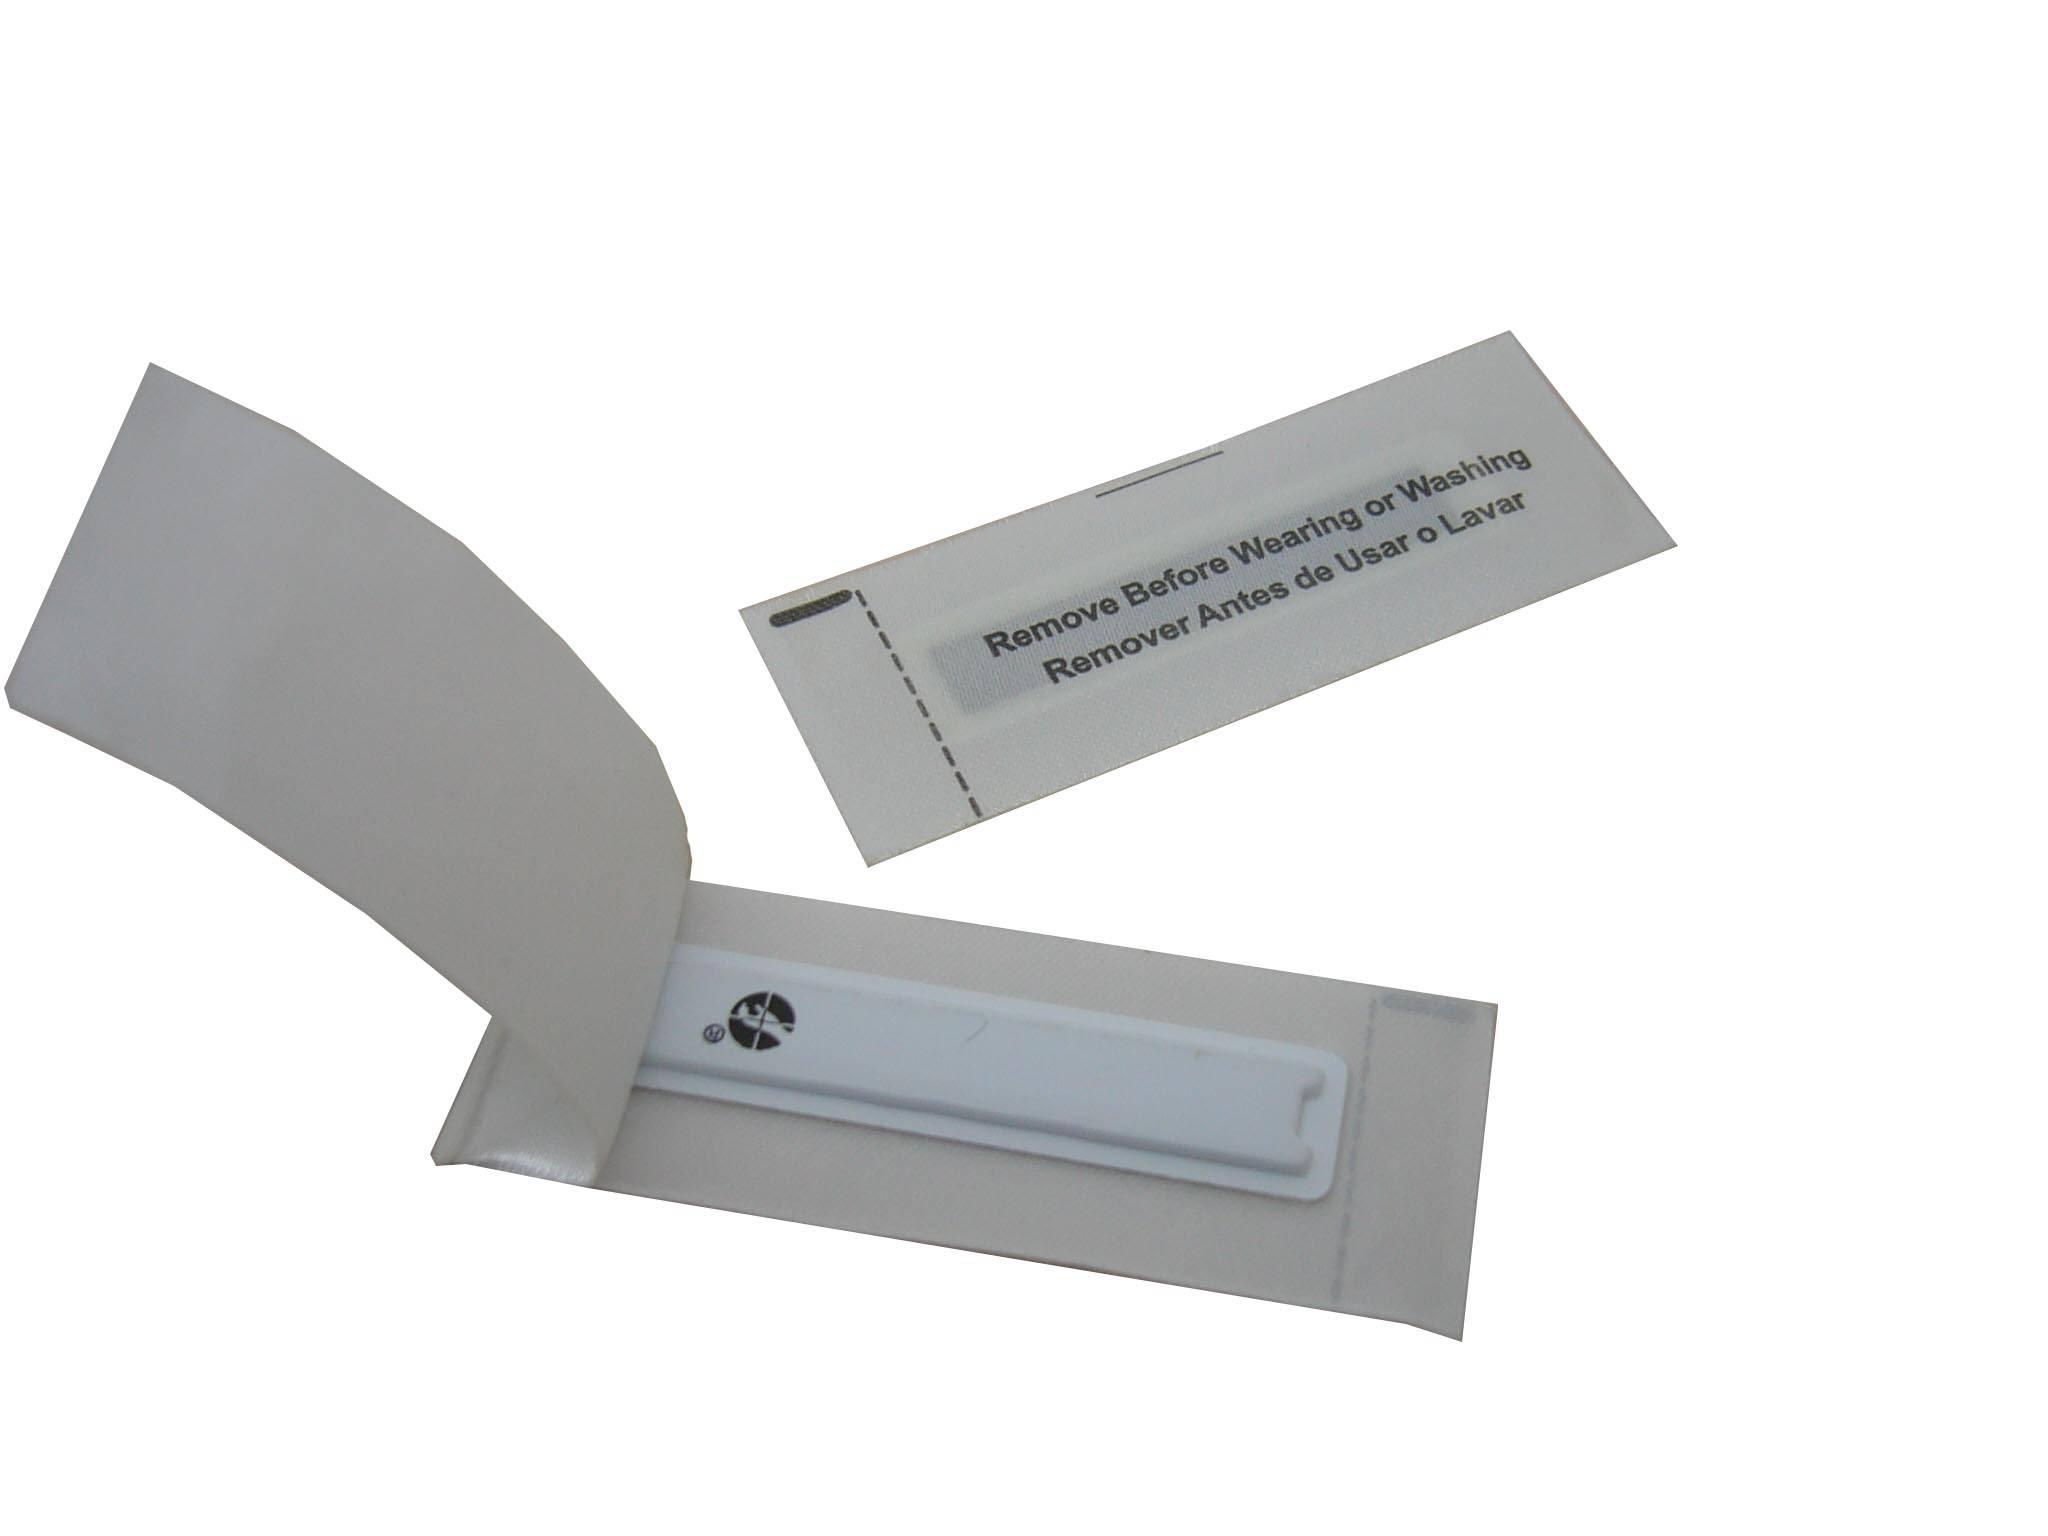 AM non-woven garment security tag